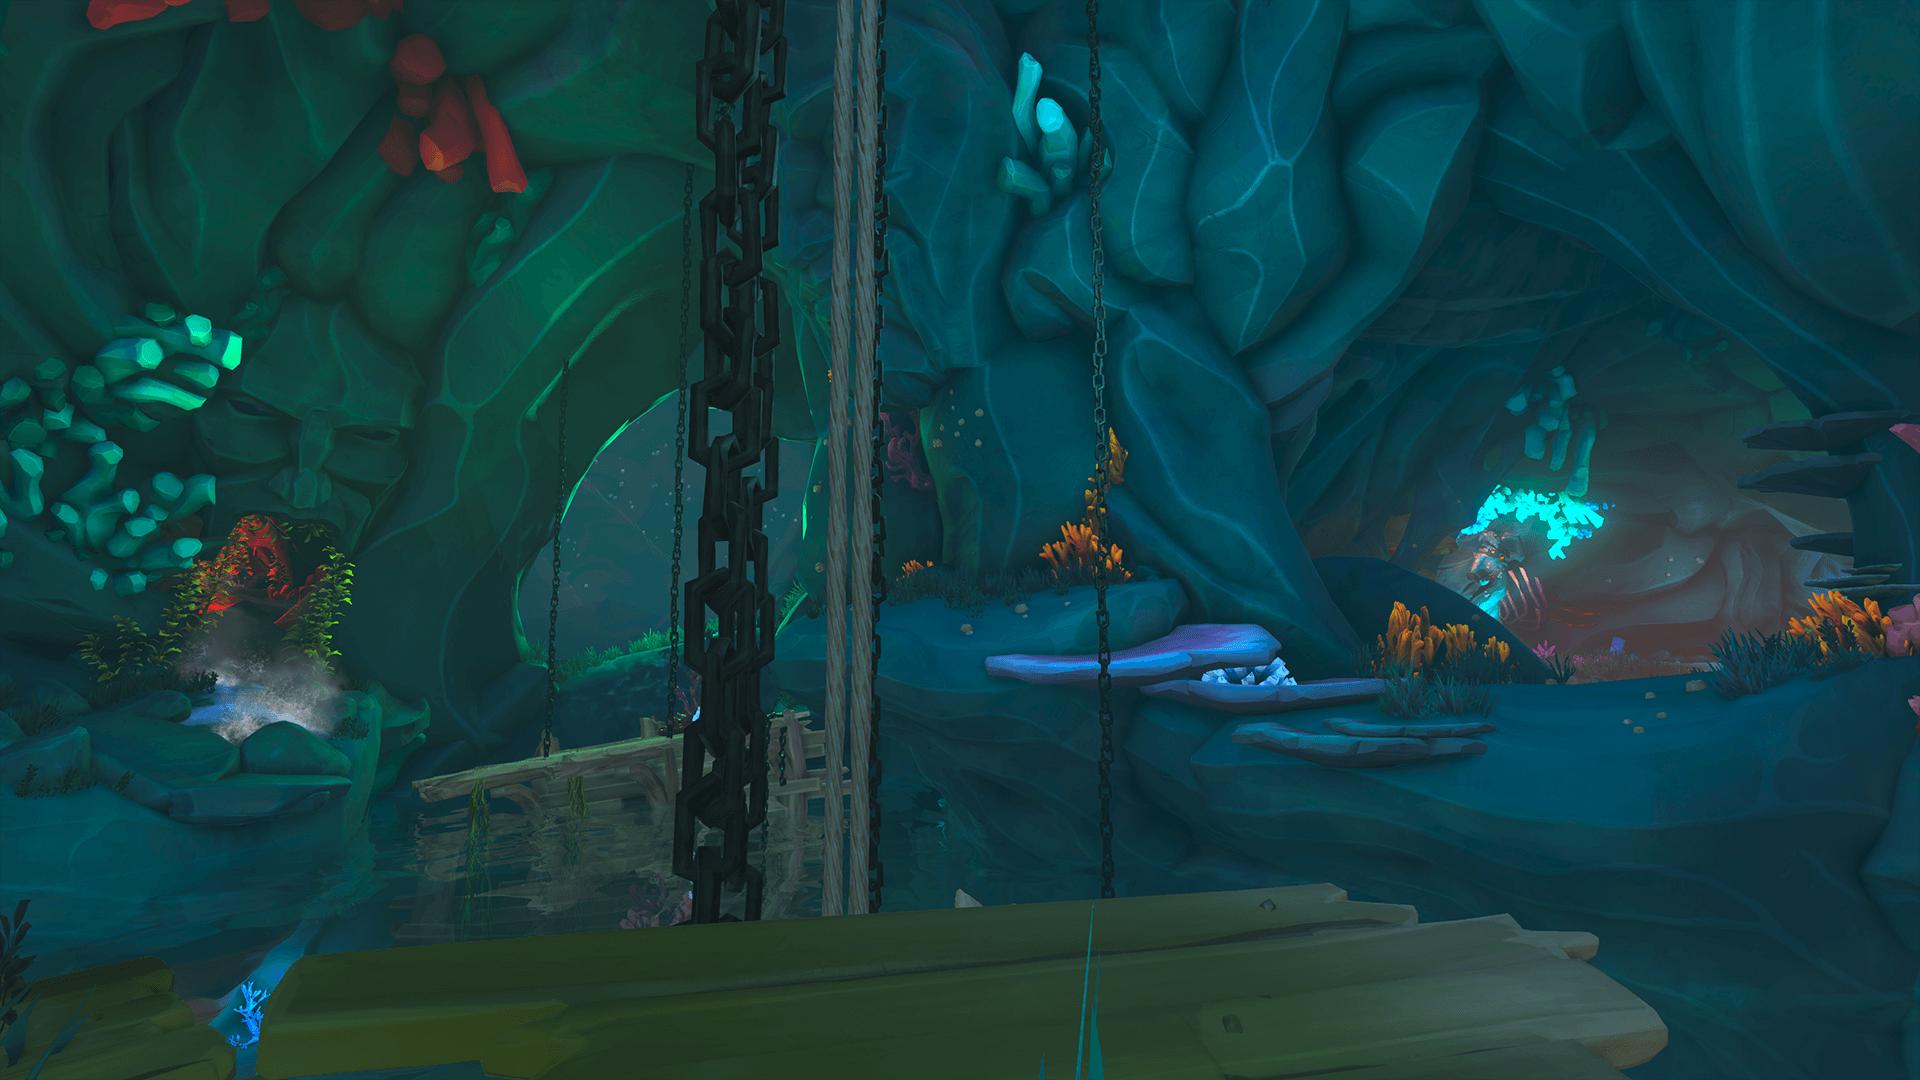 Citadel-Cavern 3-Fork in the Road